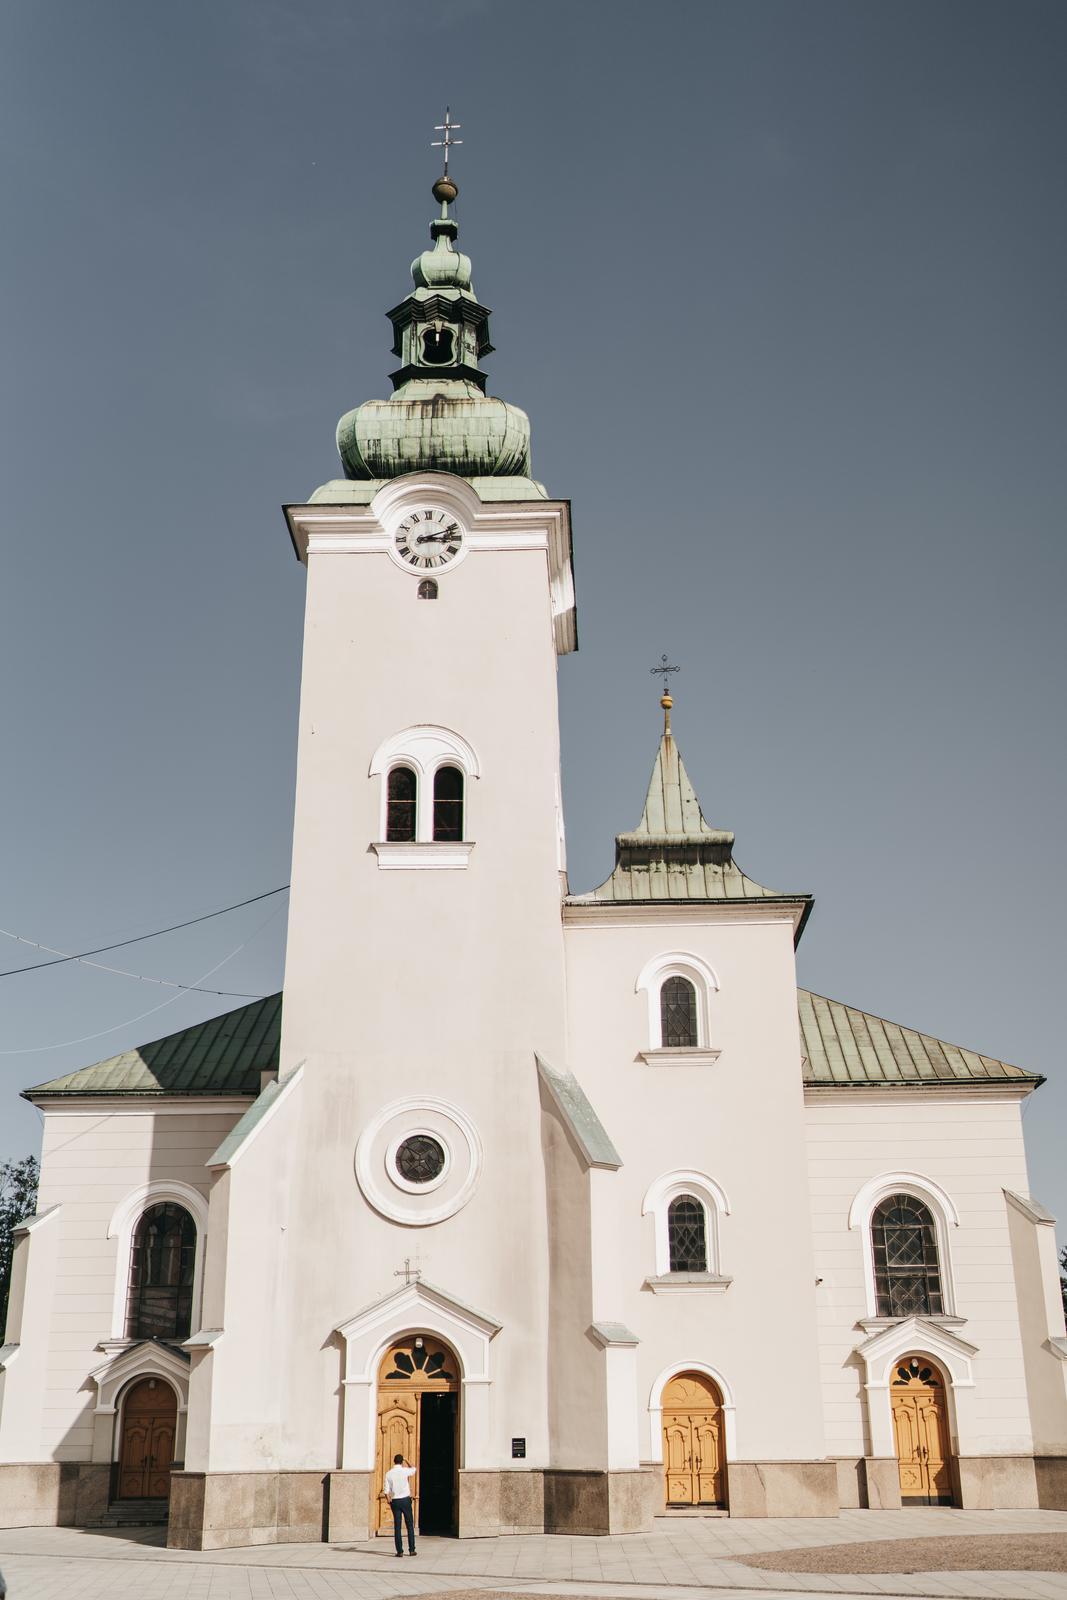 Mirka    {{_AND_}}    Tomáš - Tu sme mali obrad - Kostol sv. Ondreja, Ružomberok